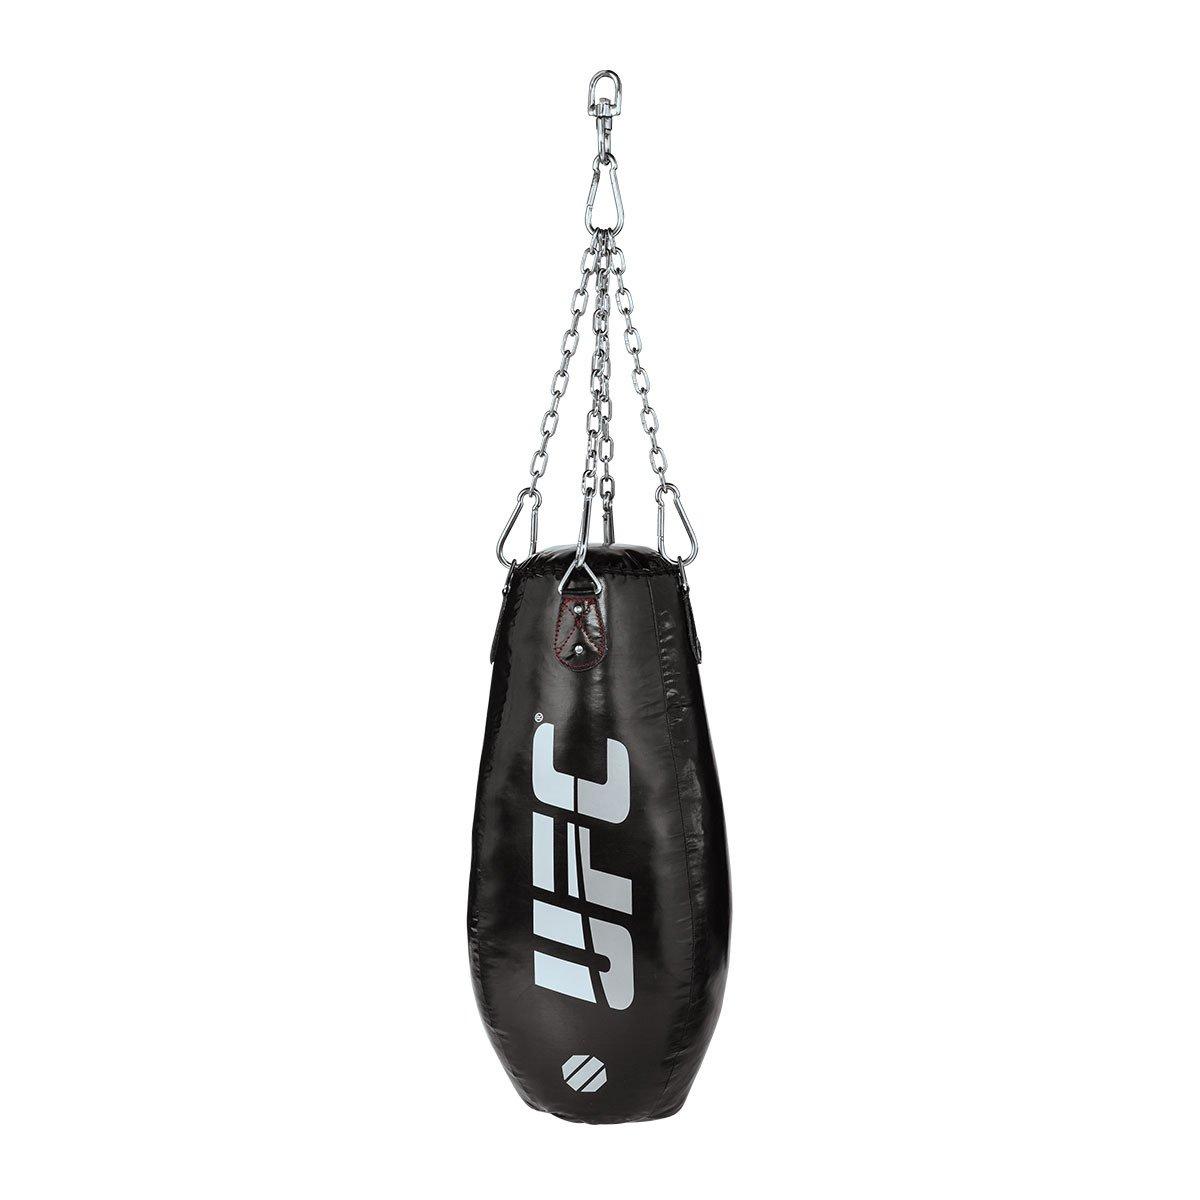 Century® UFC Professional 60 lb. Vinyl Teardrop Heavy